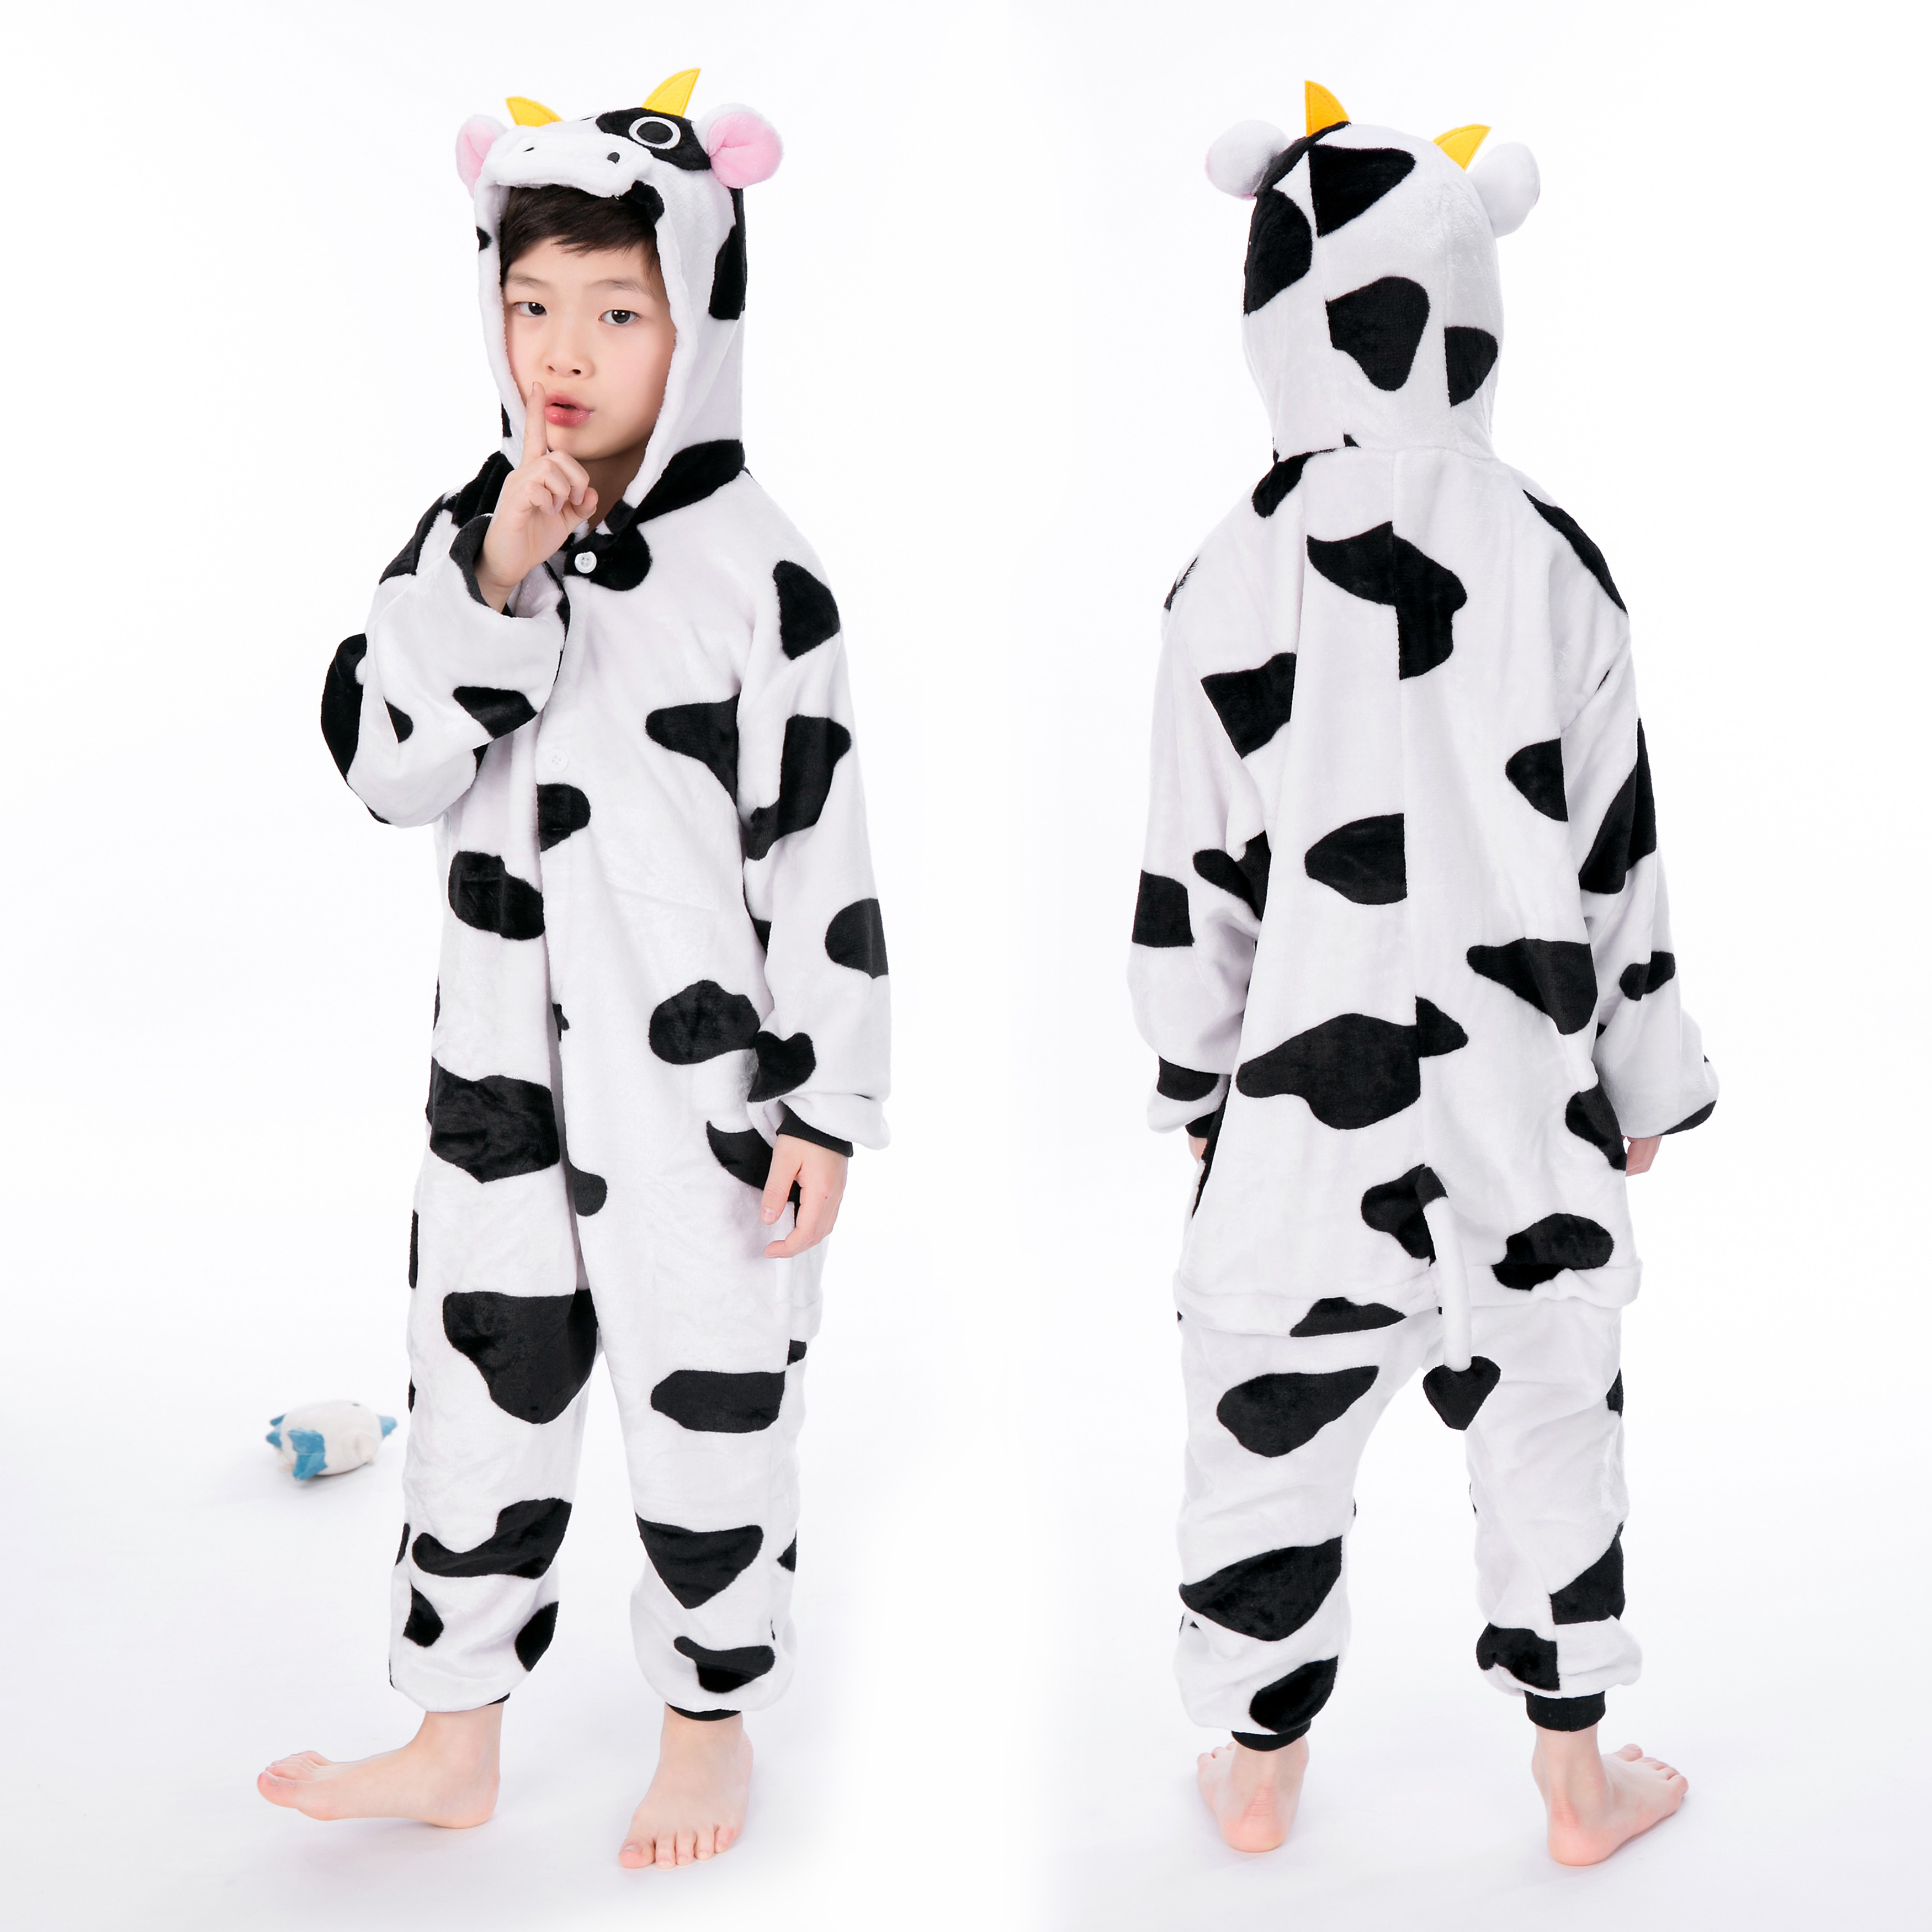 Cow Onesie For Kid Animal Kigurumi Pajama Halloween Costumes